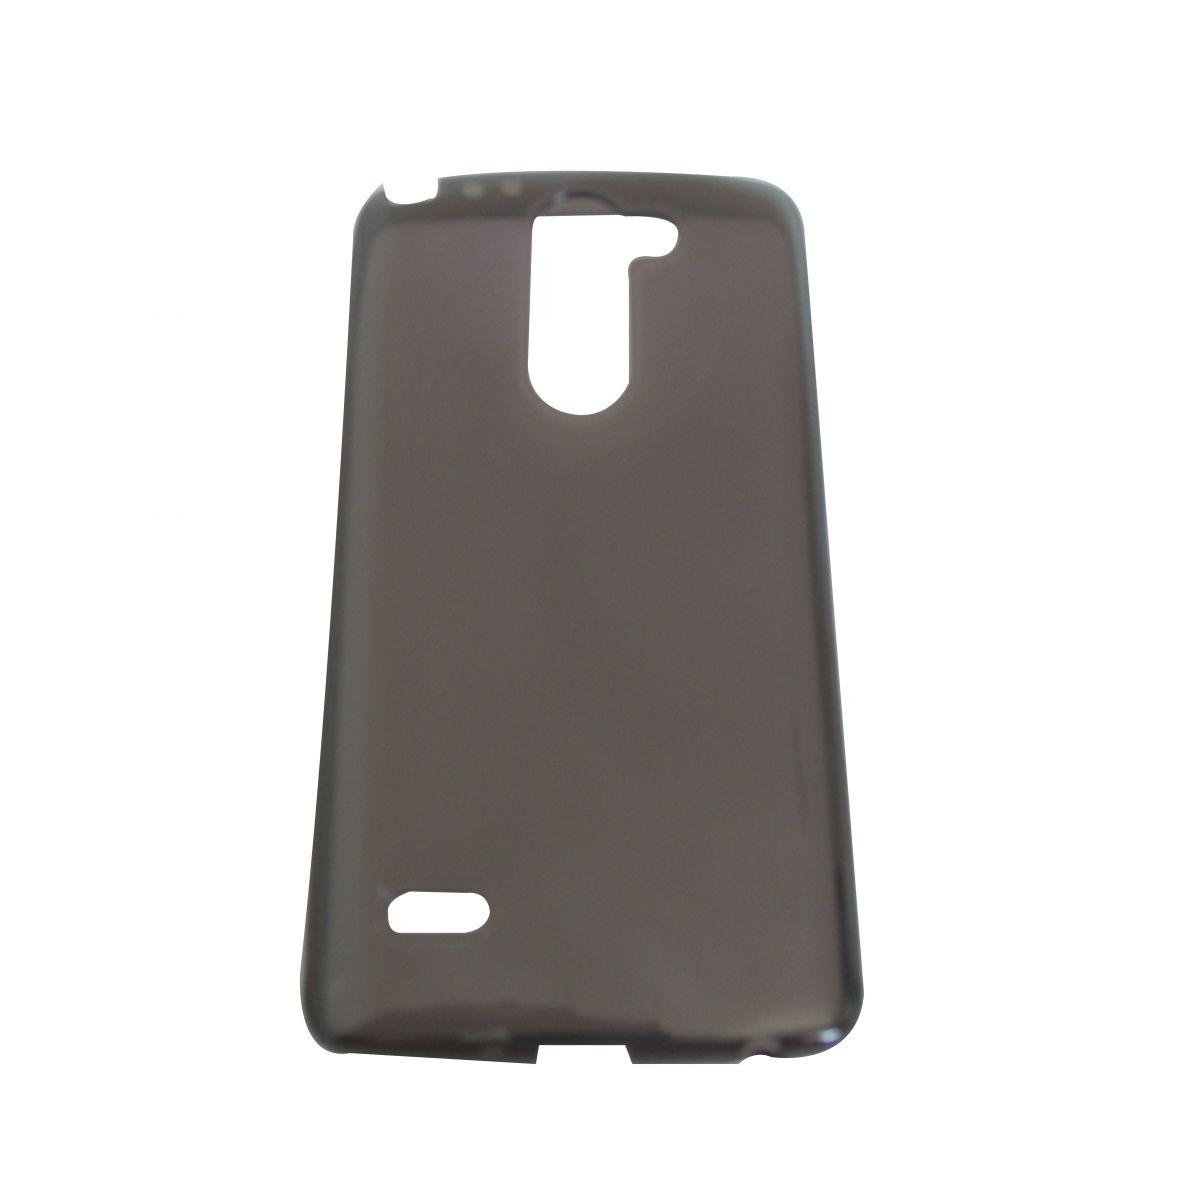 Capa TPU Grafite LG G3 Stylus D690 + Película Flexível